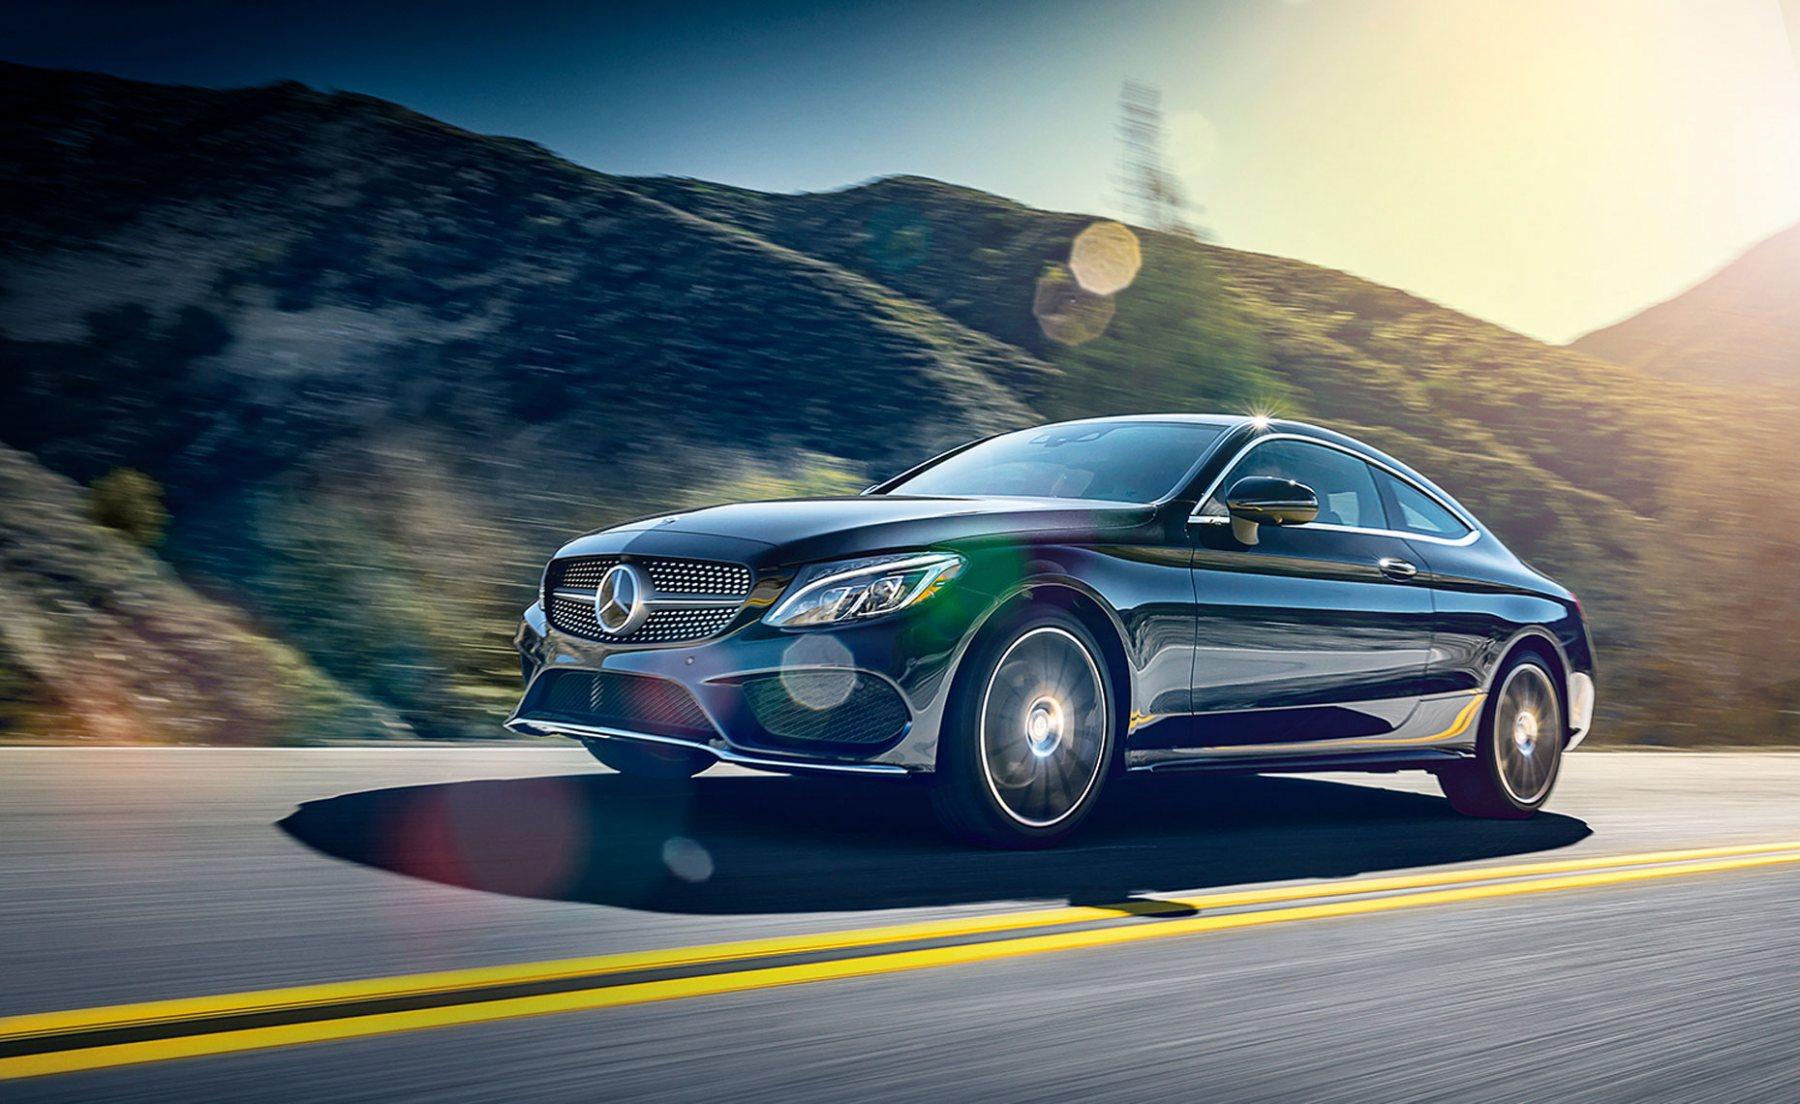 2016-02-MercedesBenzC300-AguaDulce-6148_V1x